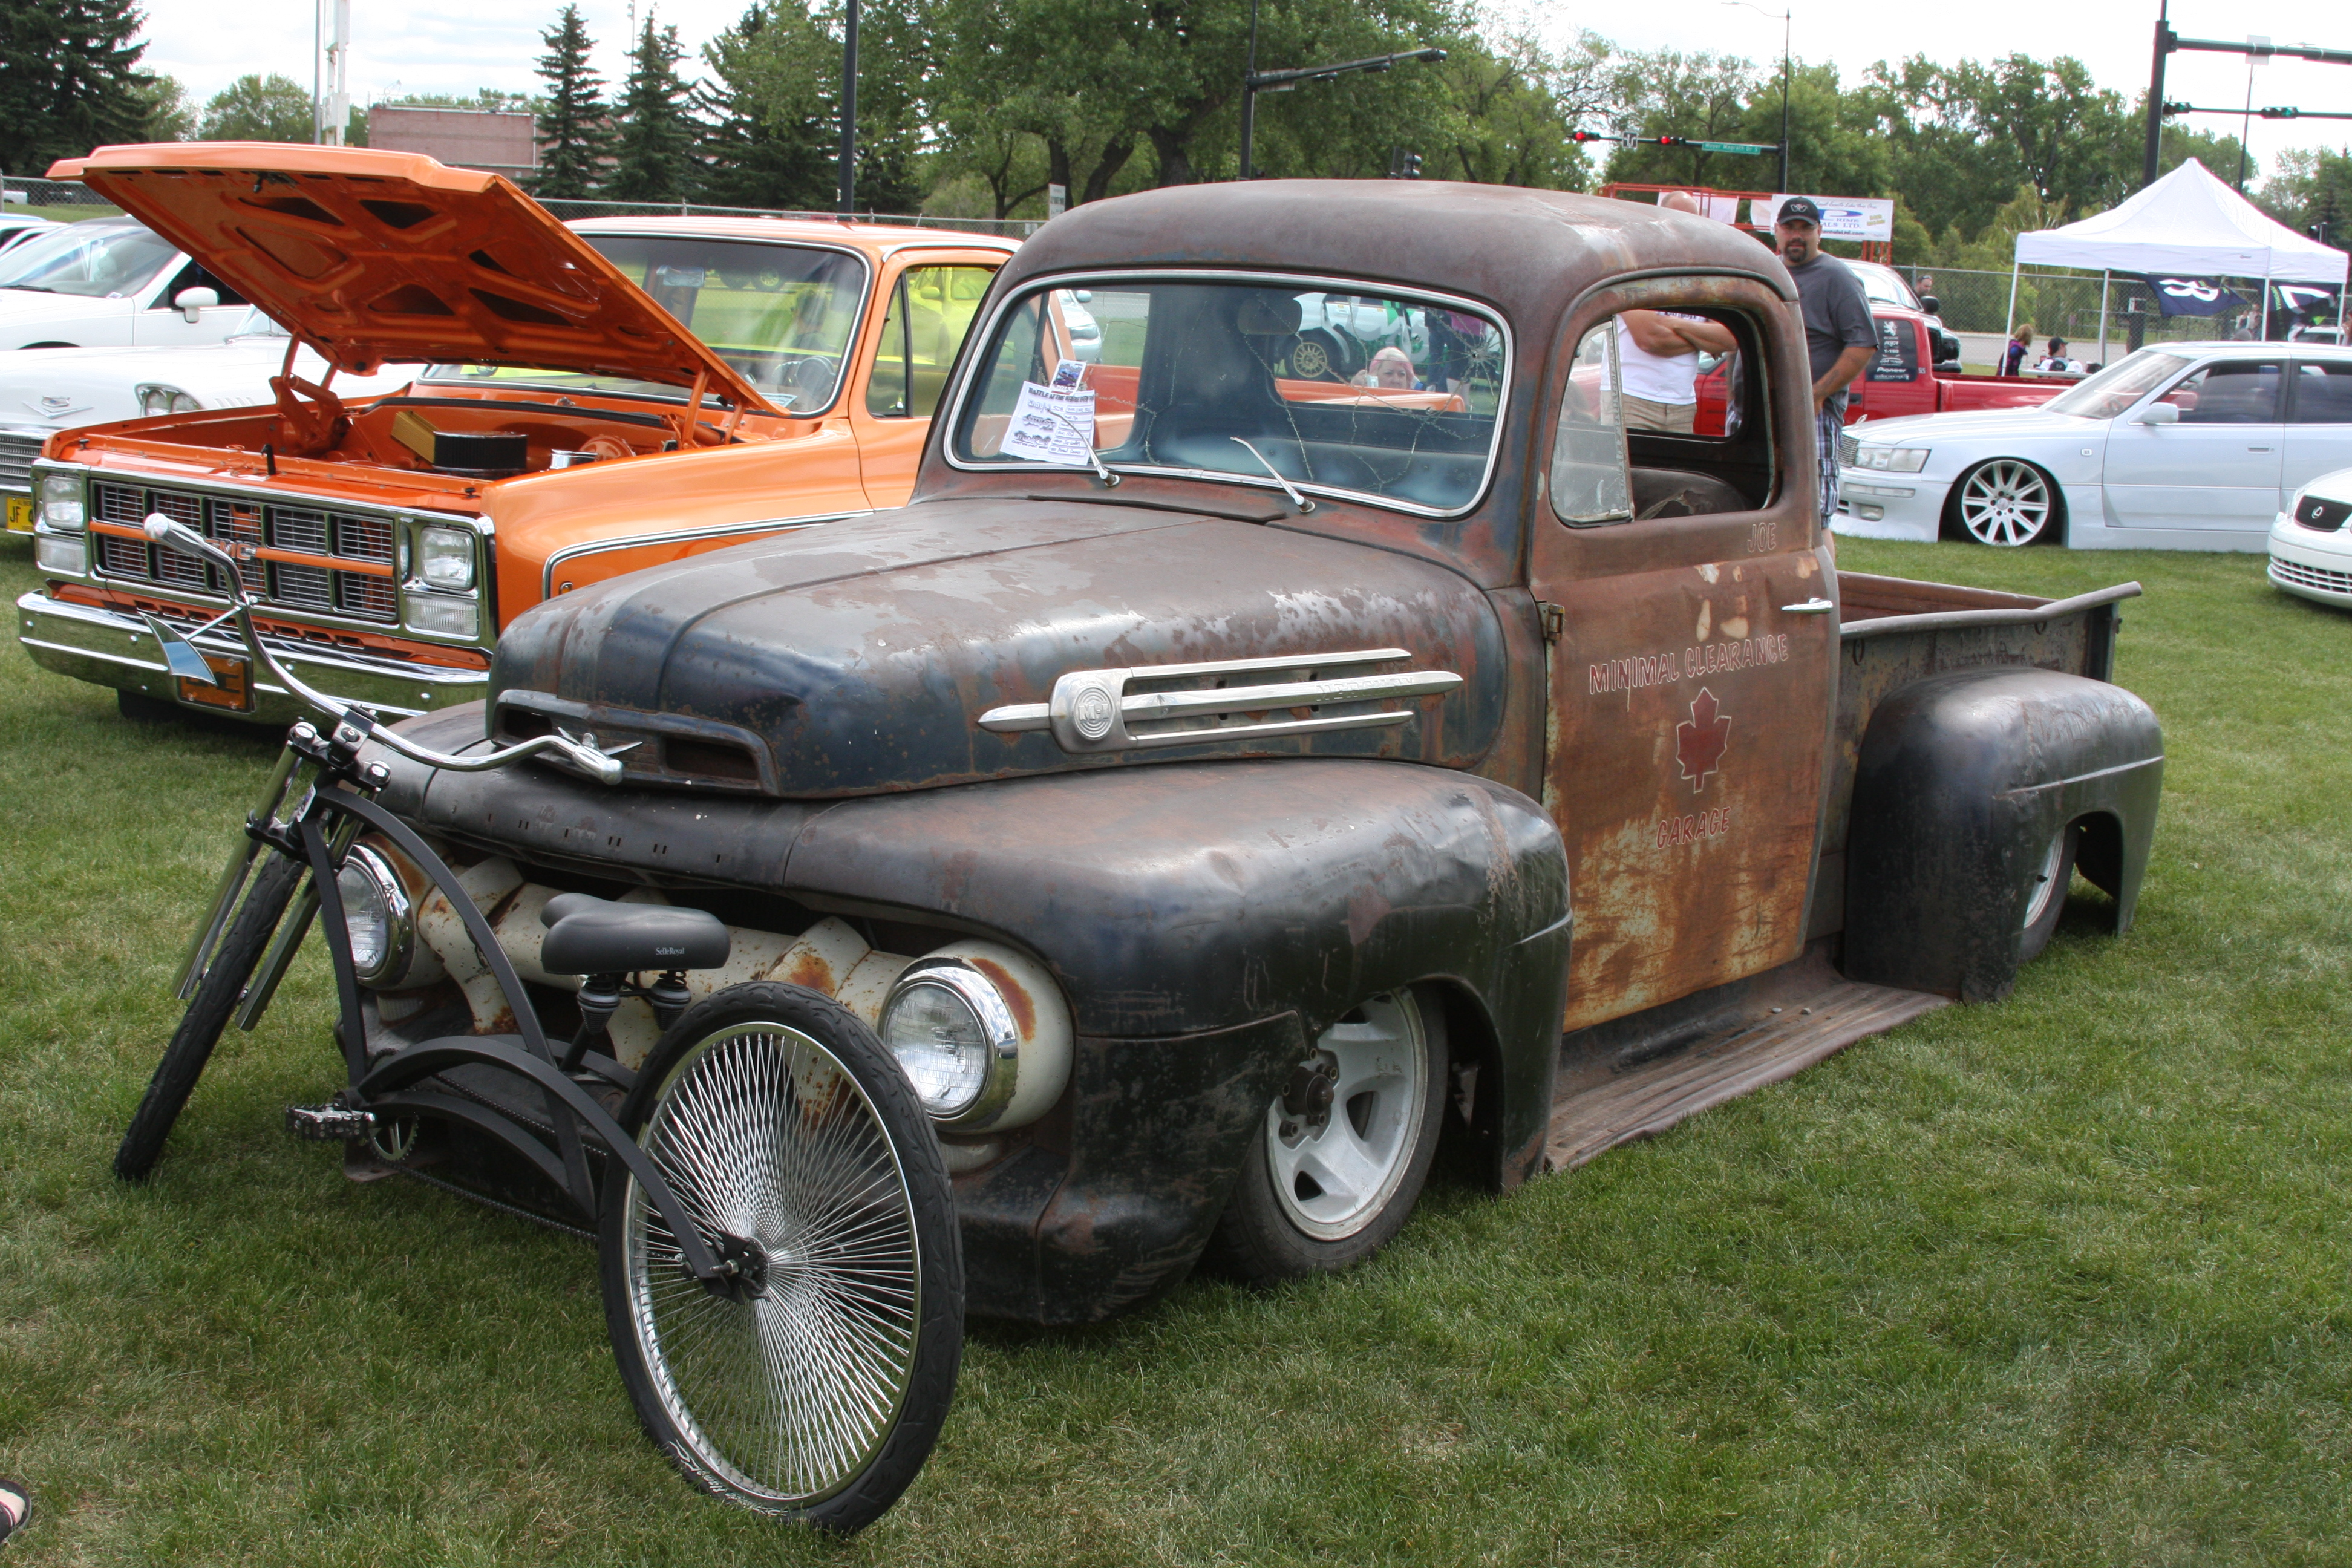 file 1952 ford f series truck 9307362071 jpg wikimedia. Black Bedroom Furniture Sets. Home Design Ideas